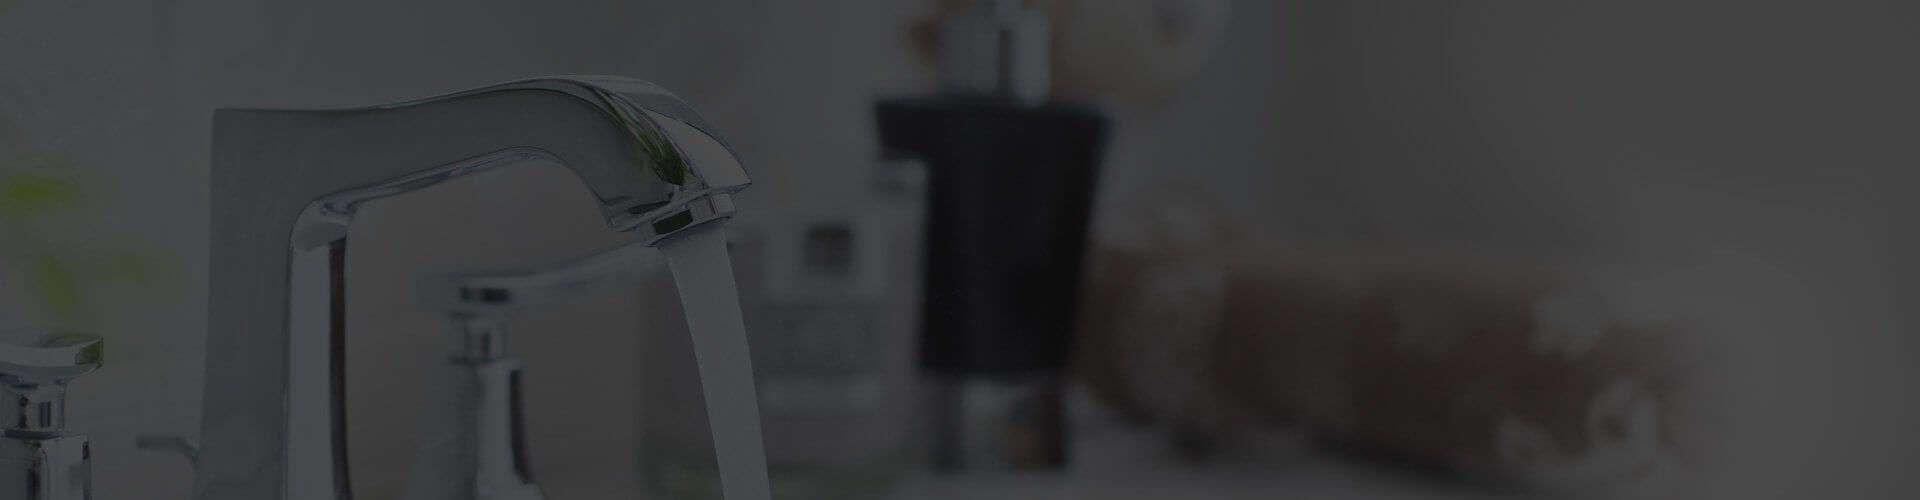 home1slider1-video-image